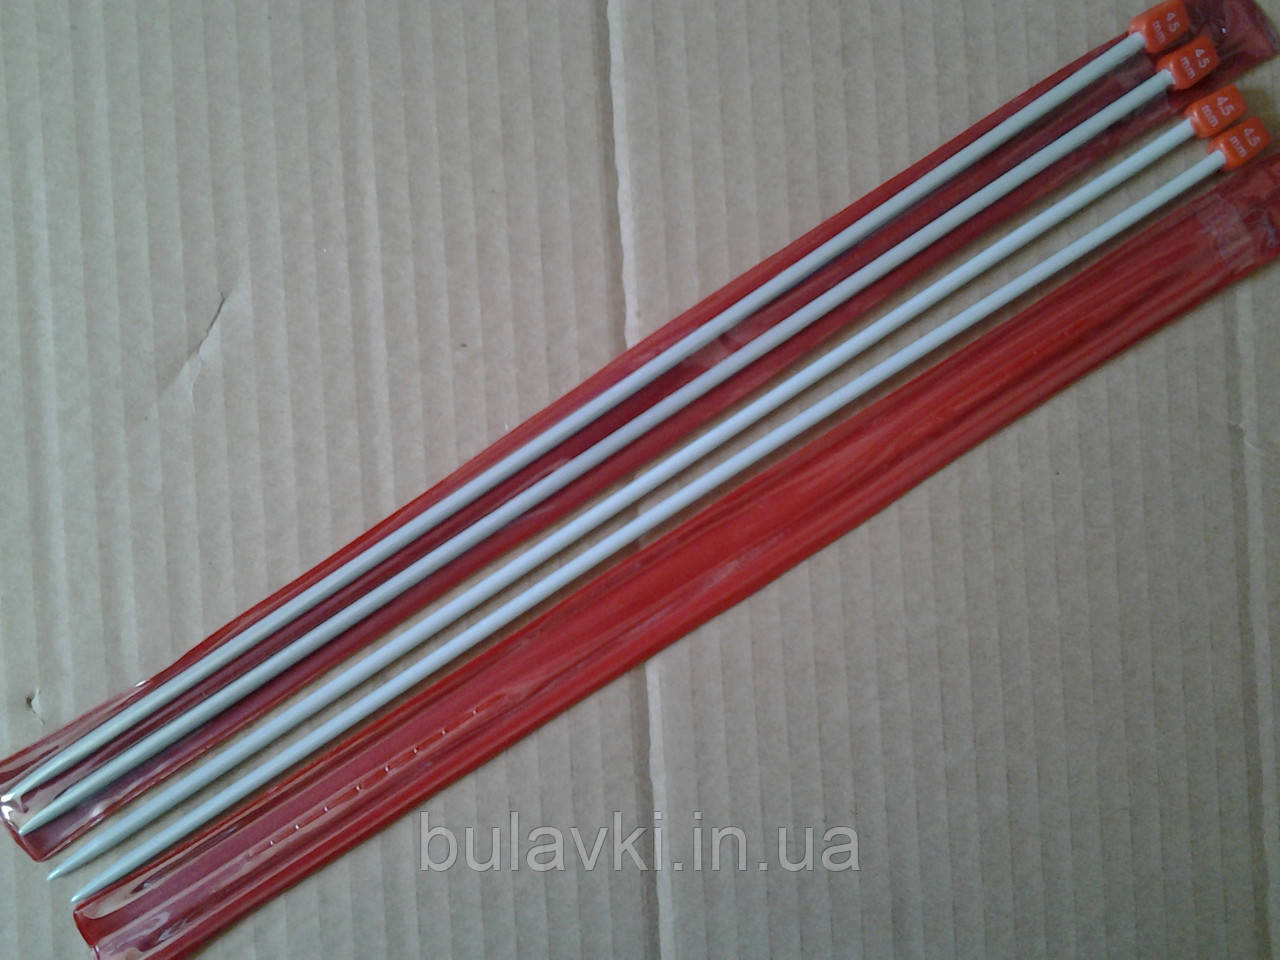 Спица прямая вязальная тефлоновая 4,5мм